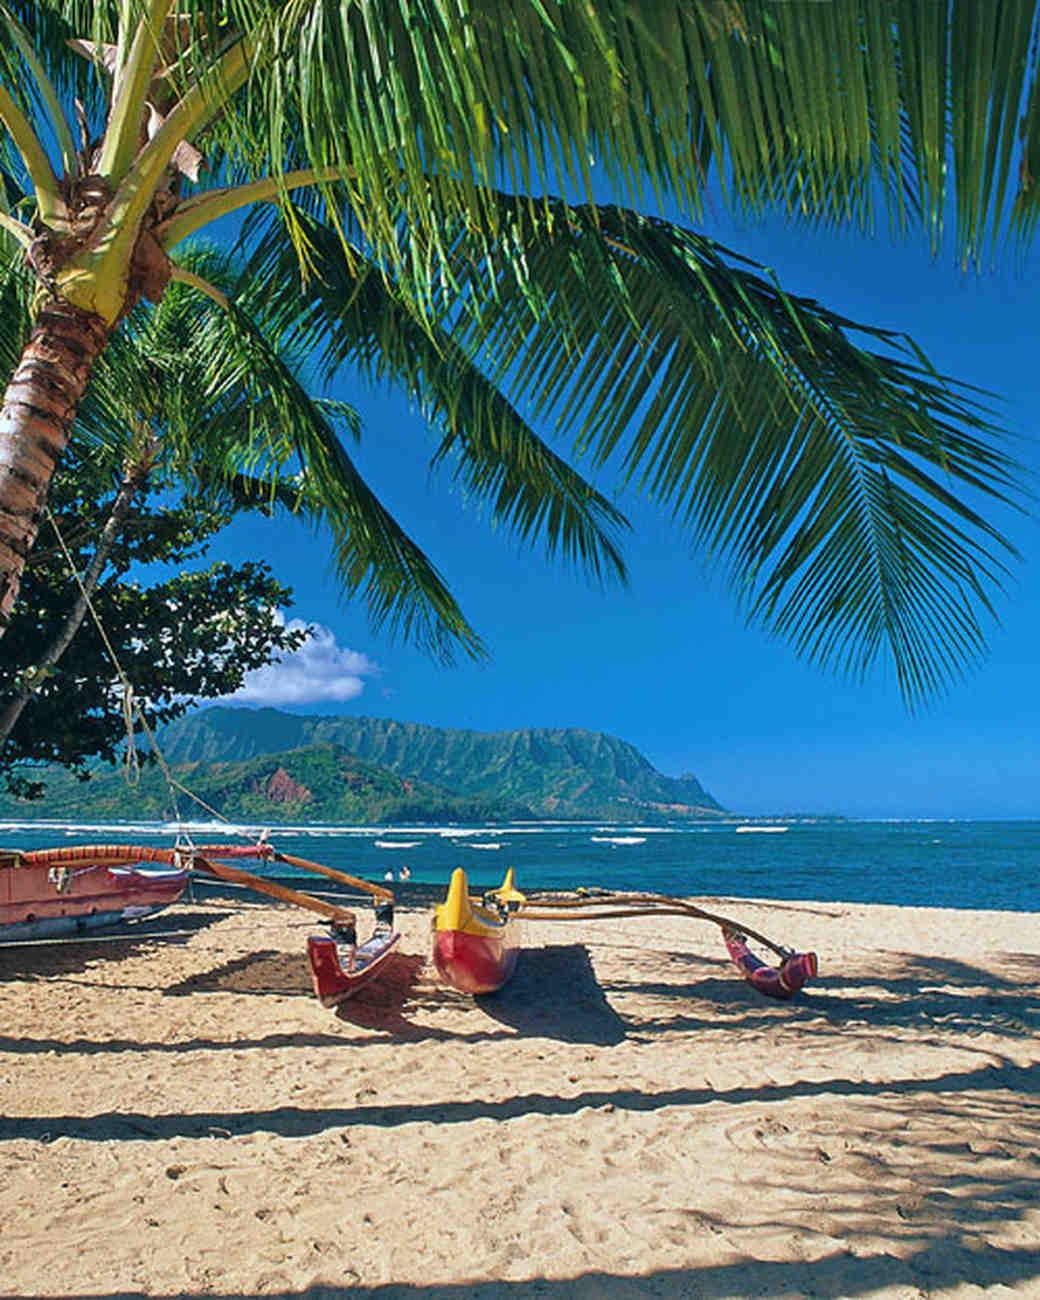 South Pacific Beaches